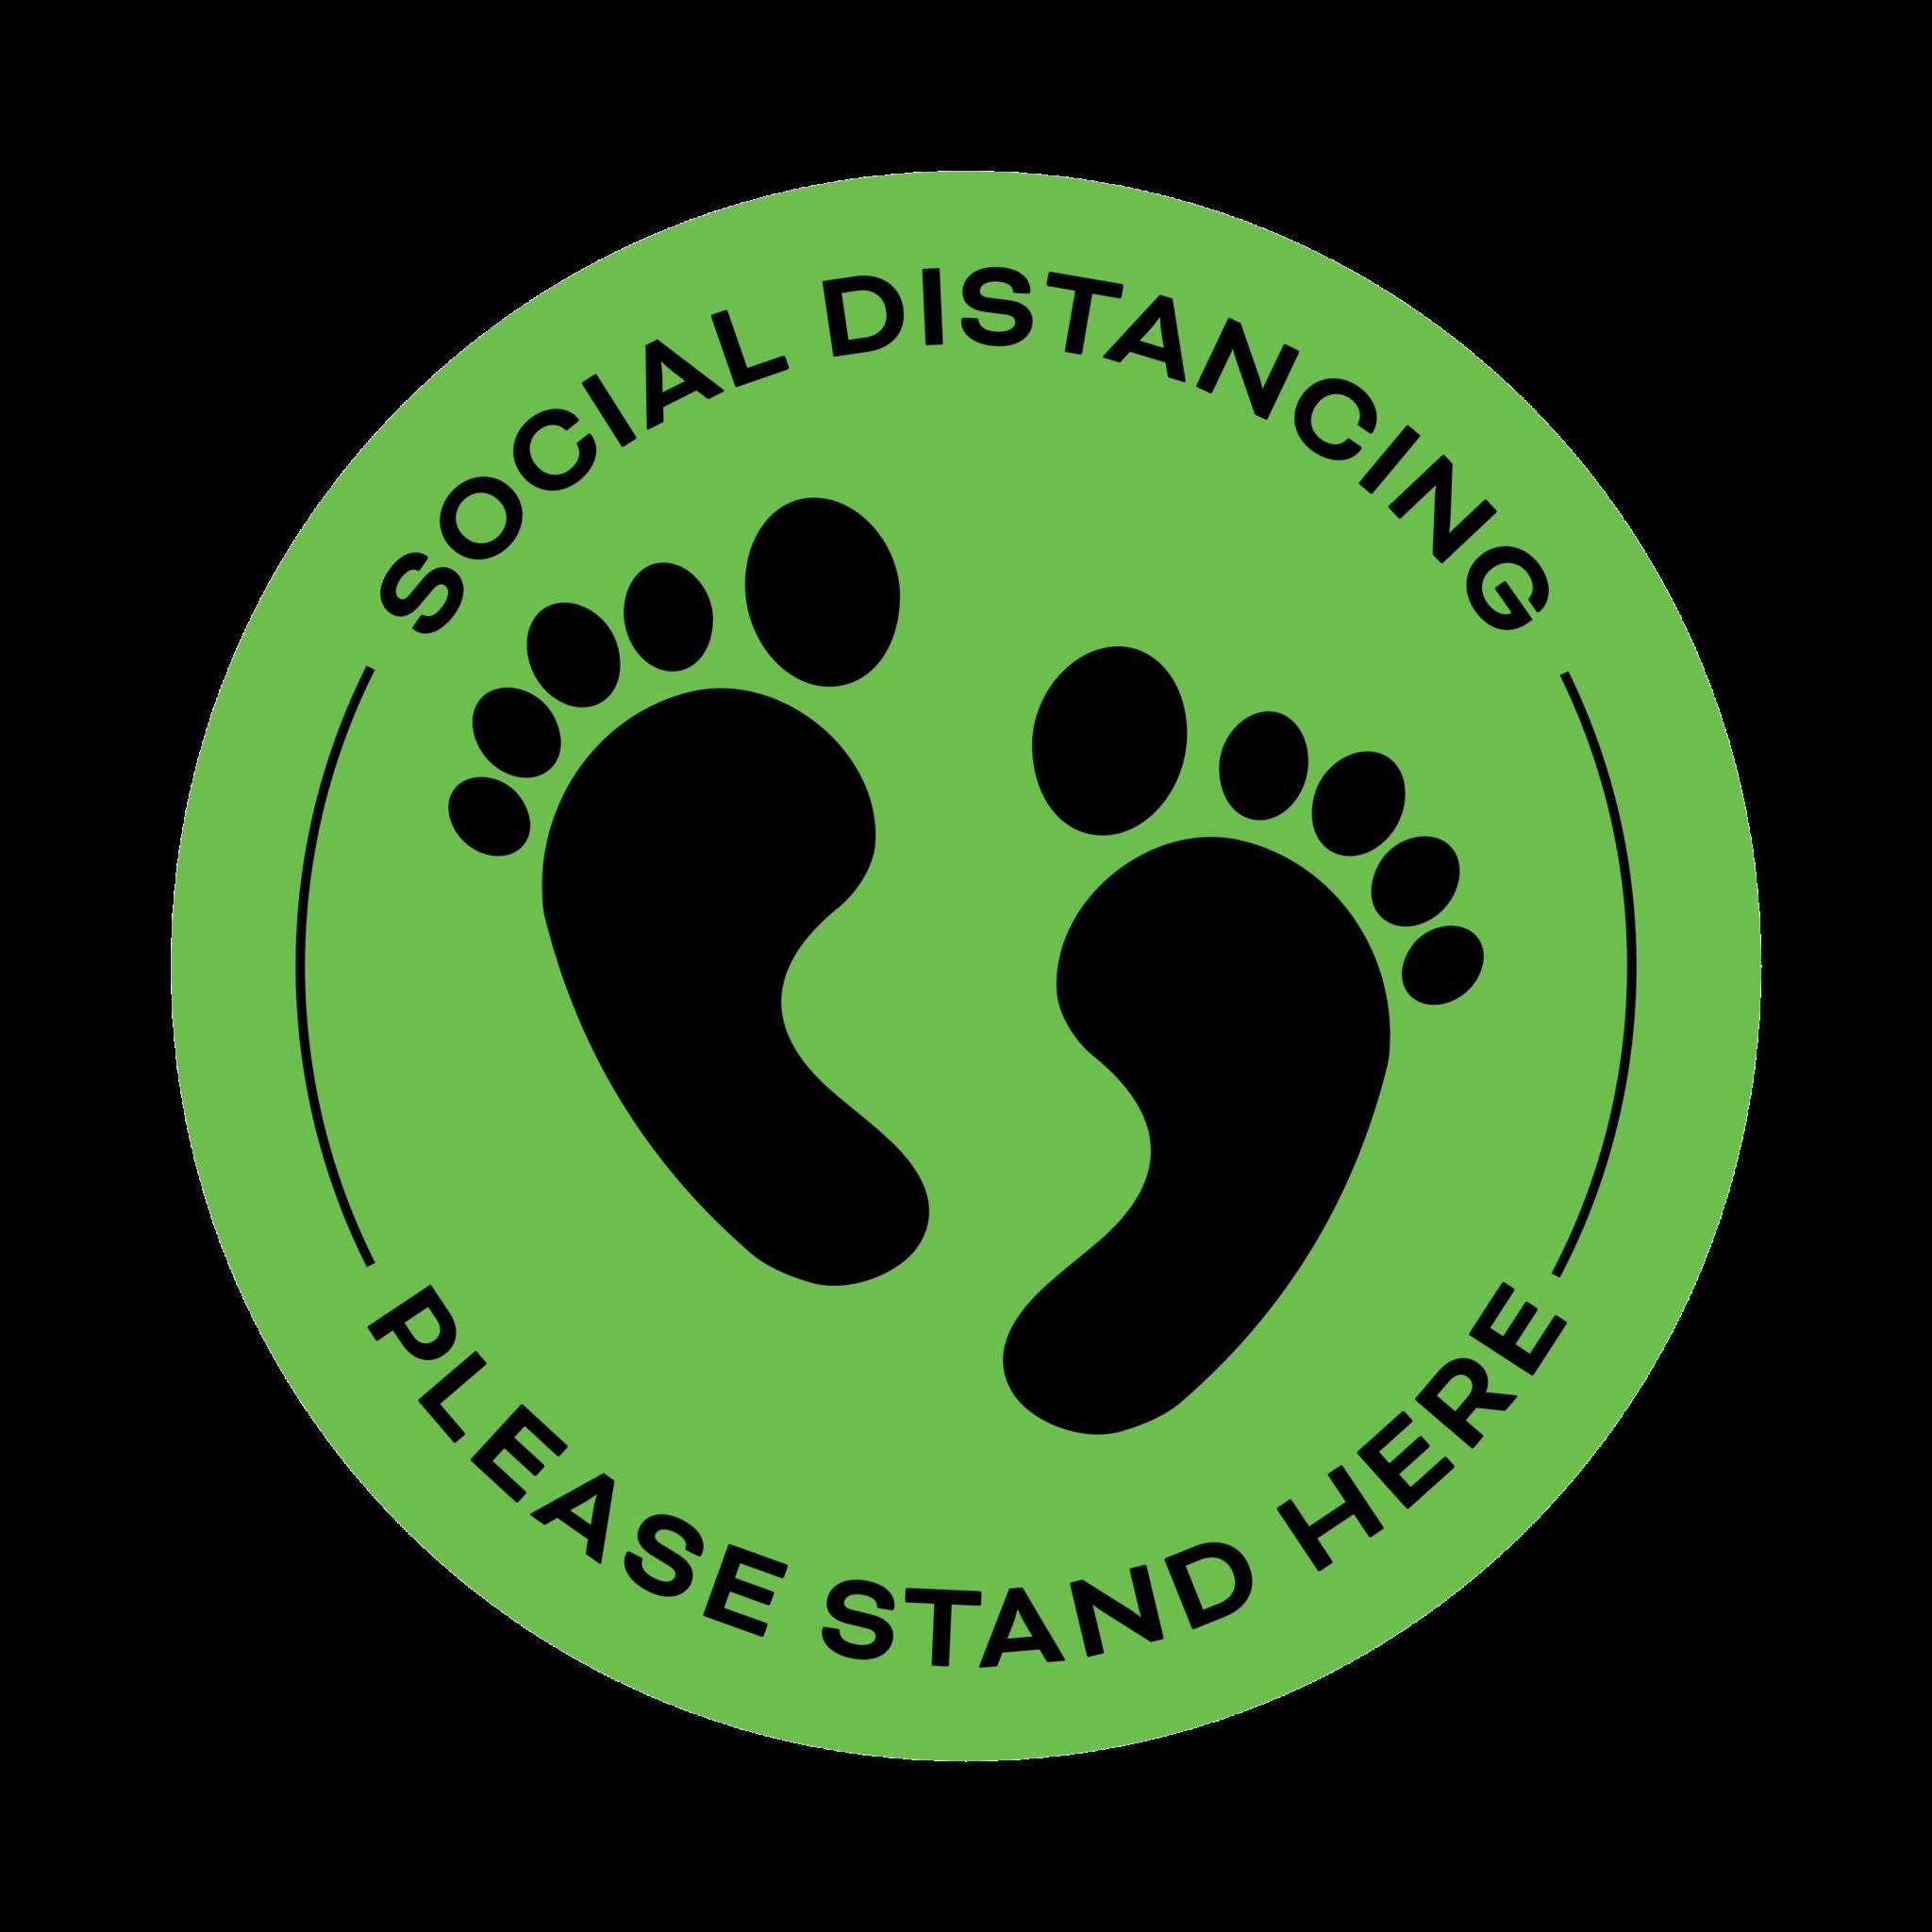 Covid 19 Social Distancing Floor Sticker Green